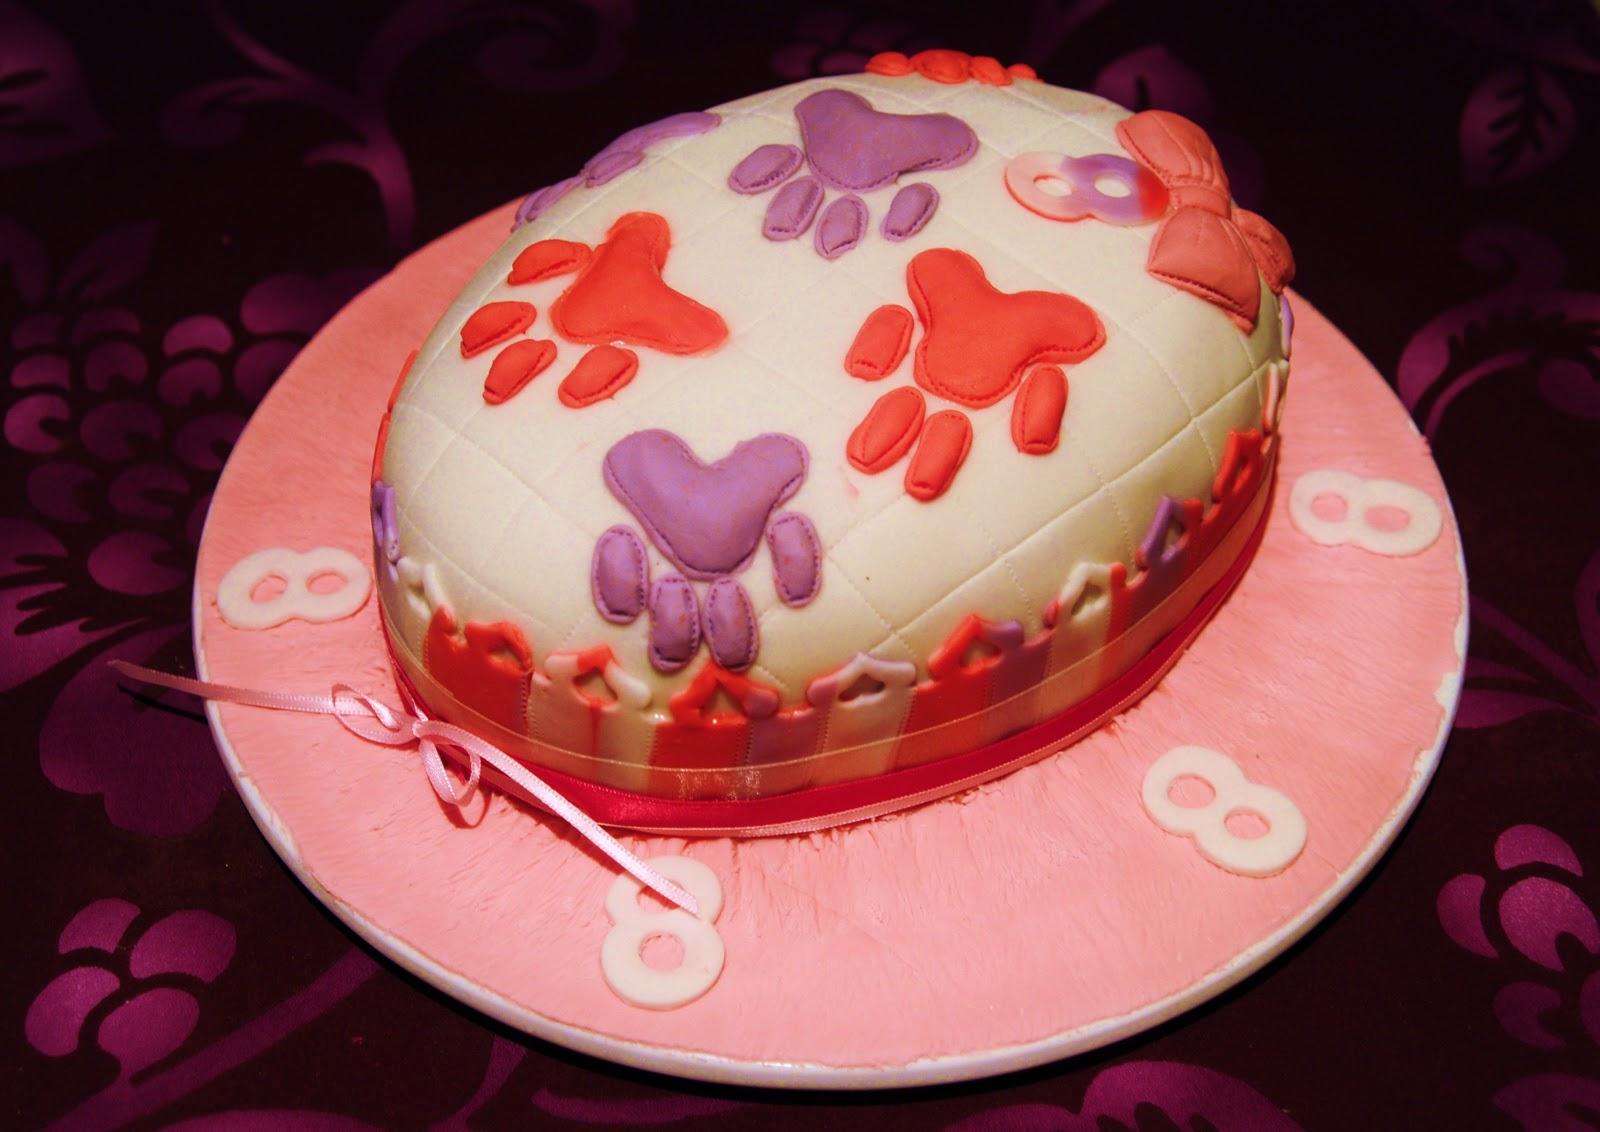 Xmas Cake Victoria Sponge And Royal Icing